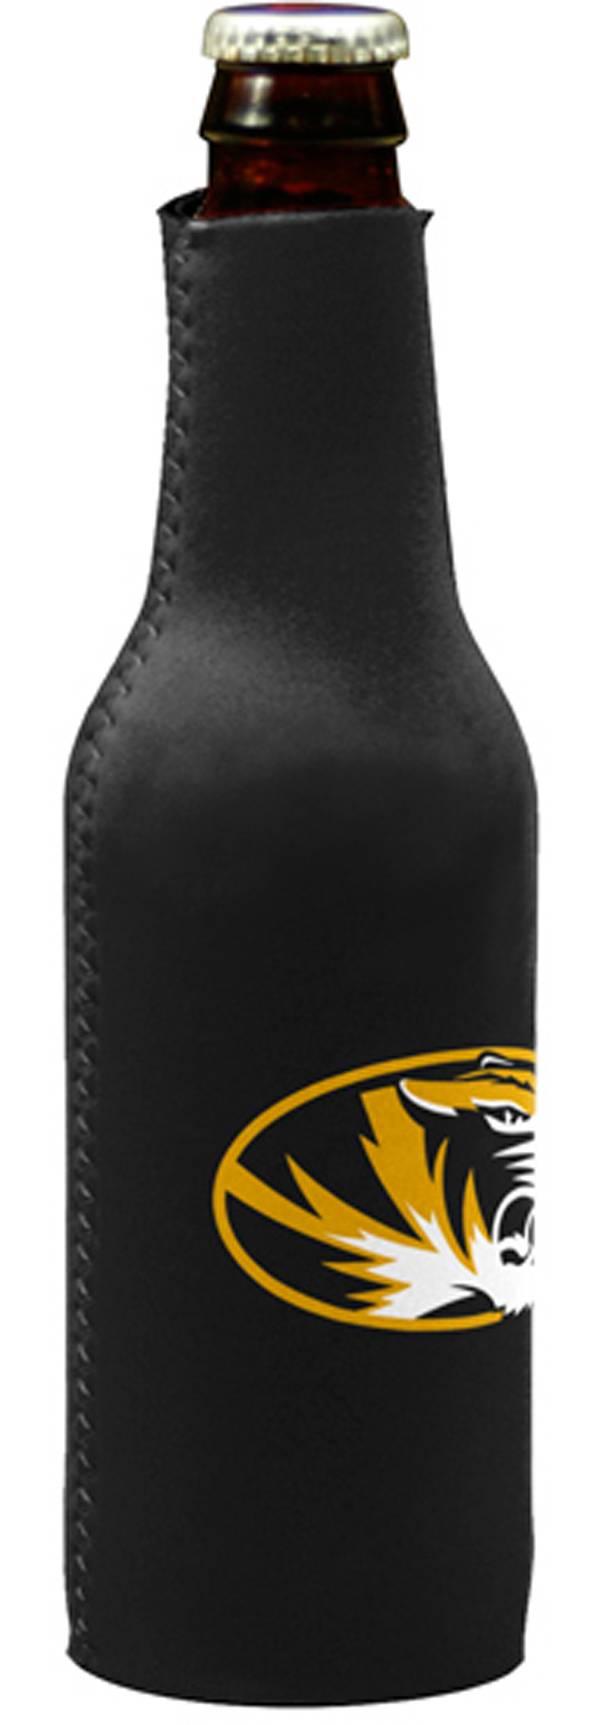 Missouri Tigers Bottle Koozie product image